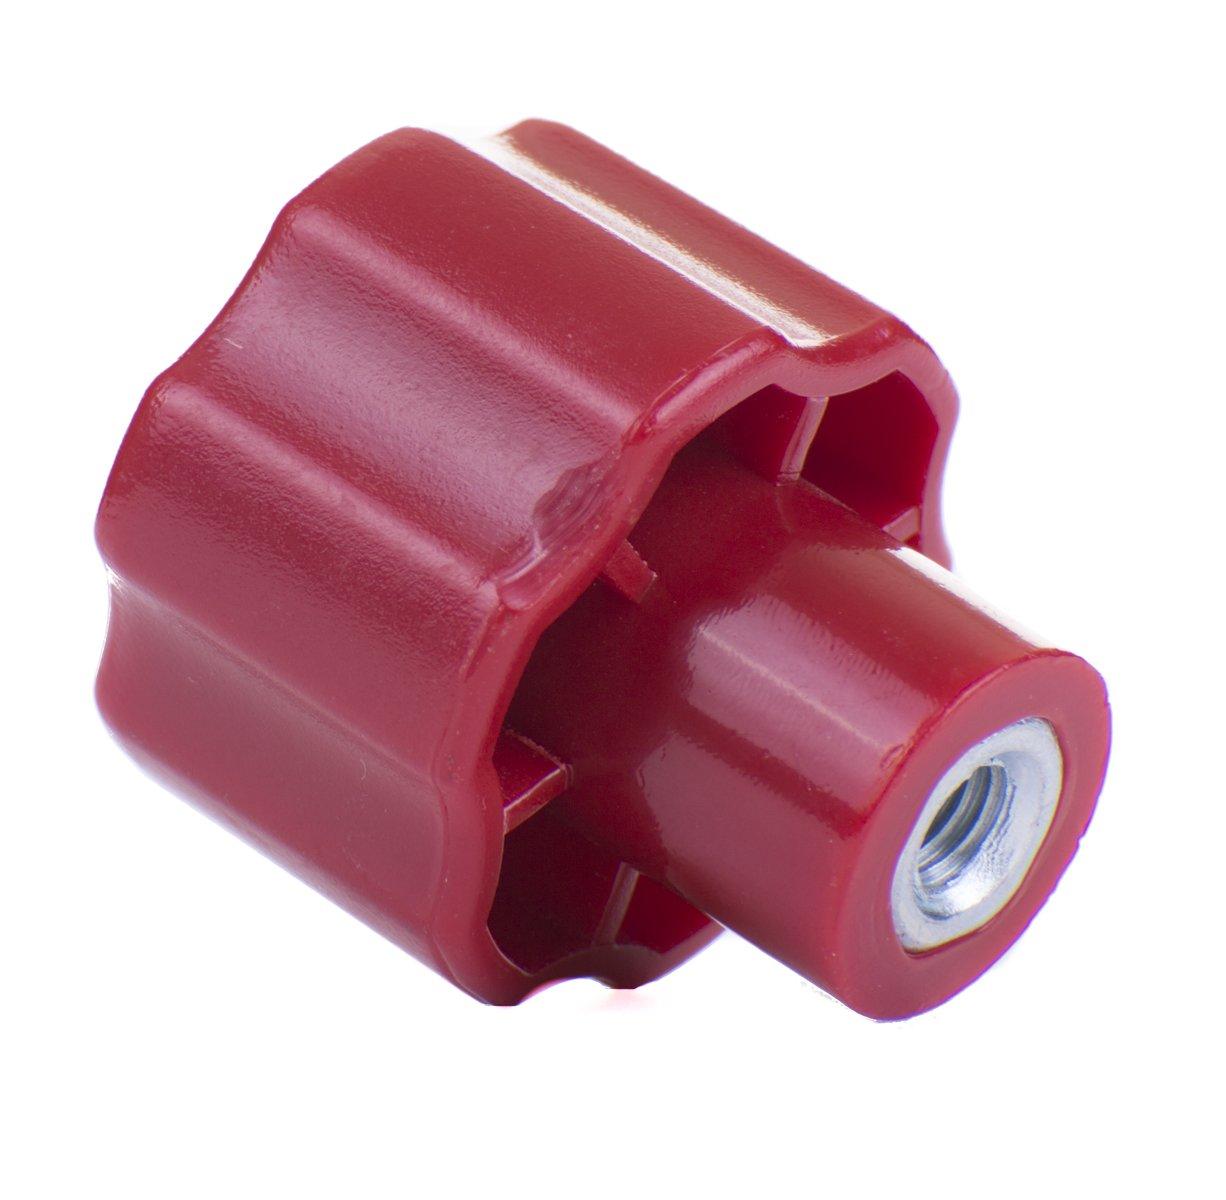 Skil Parts 2610958967 Knob for Roller